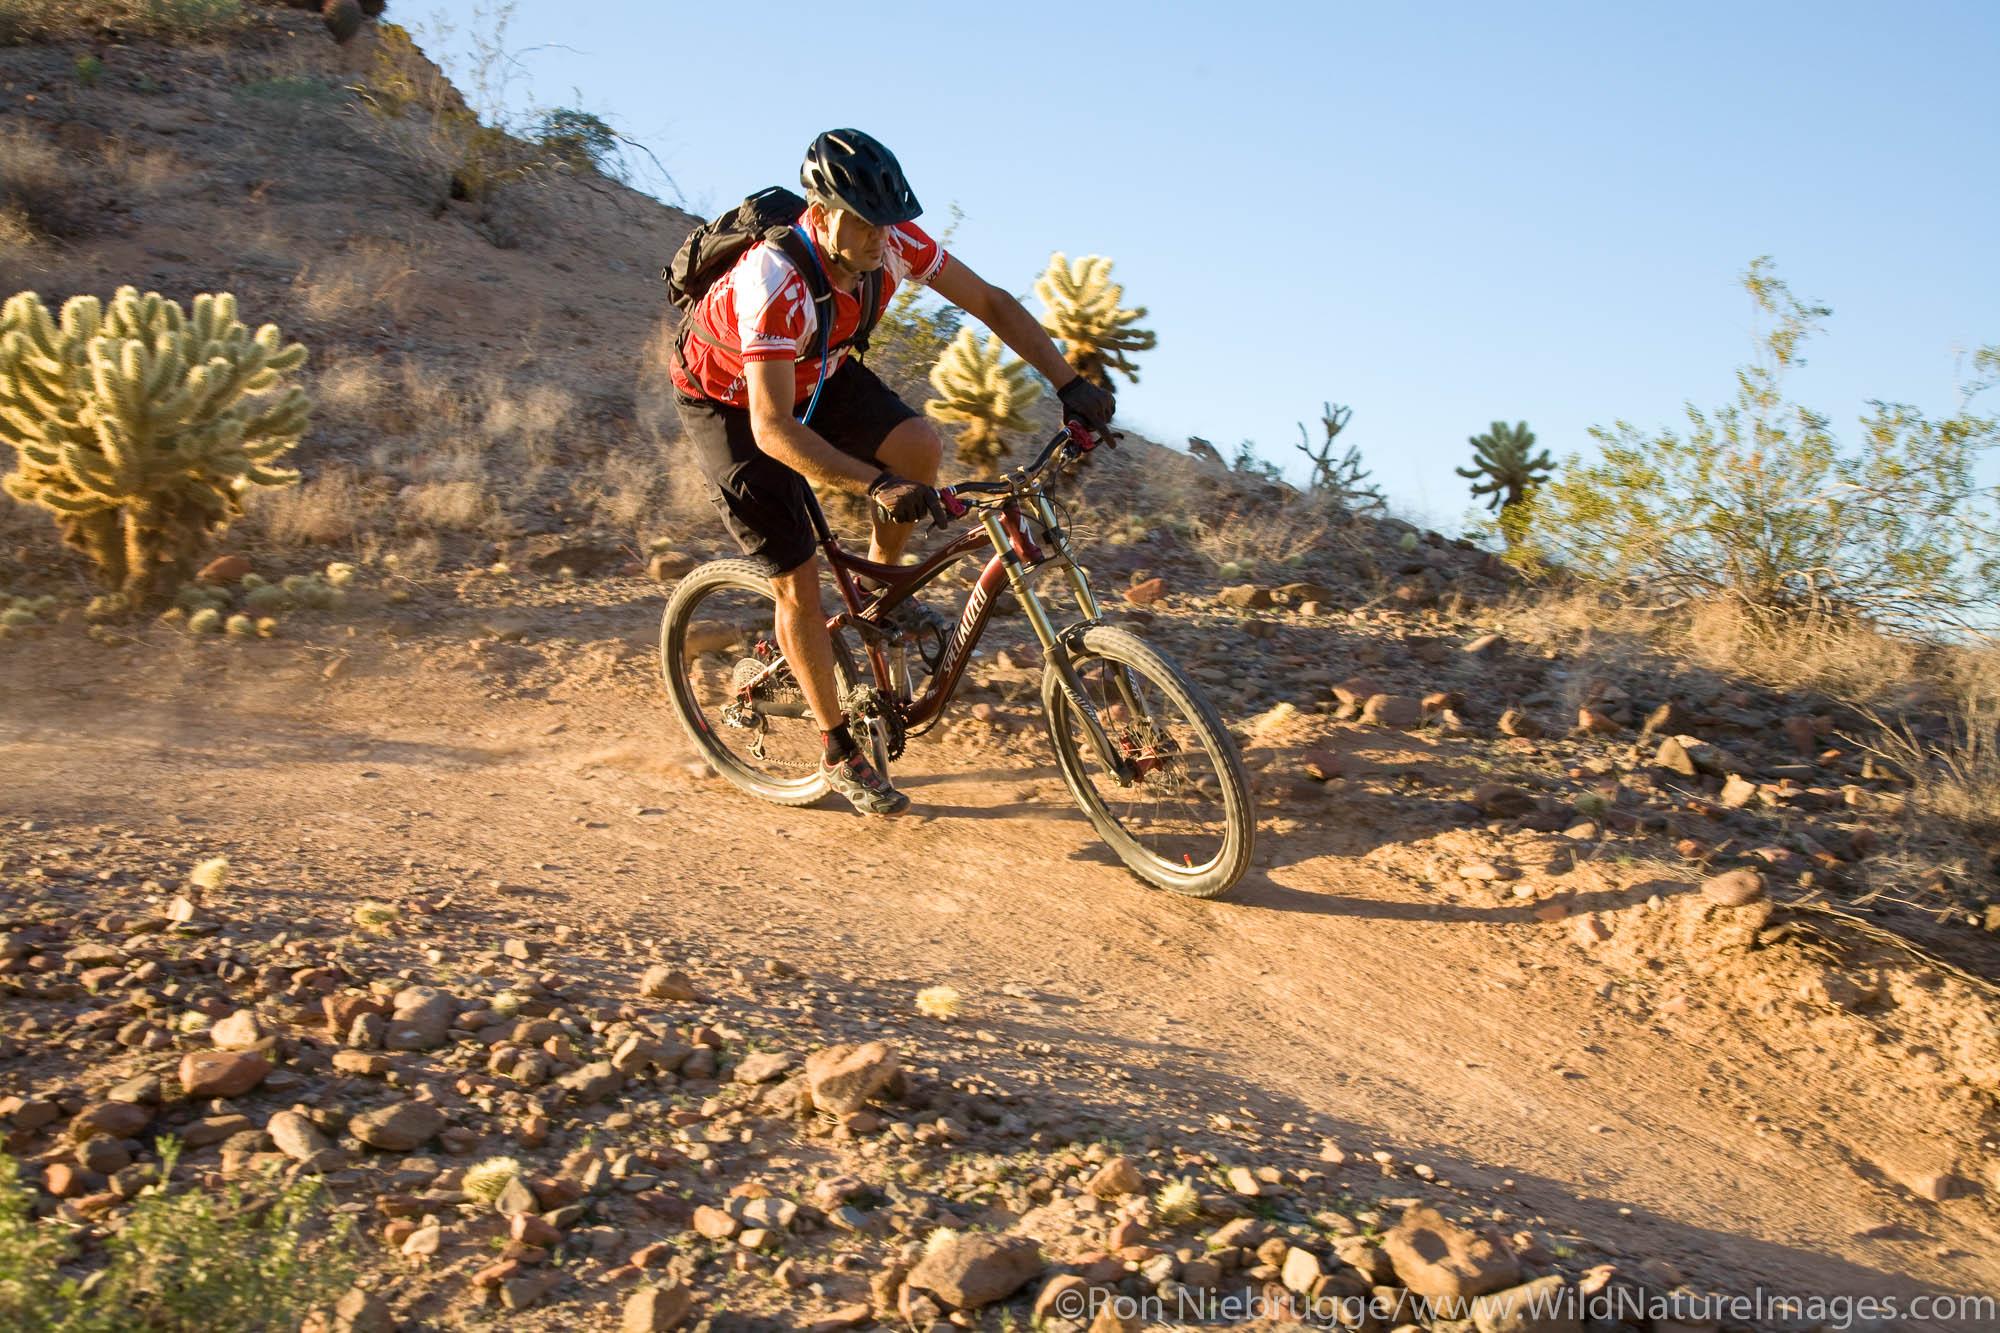 Mountain biking at McDowell Mountain Park near Phoenix, Ariziona. (Model Released)